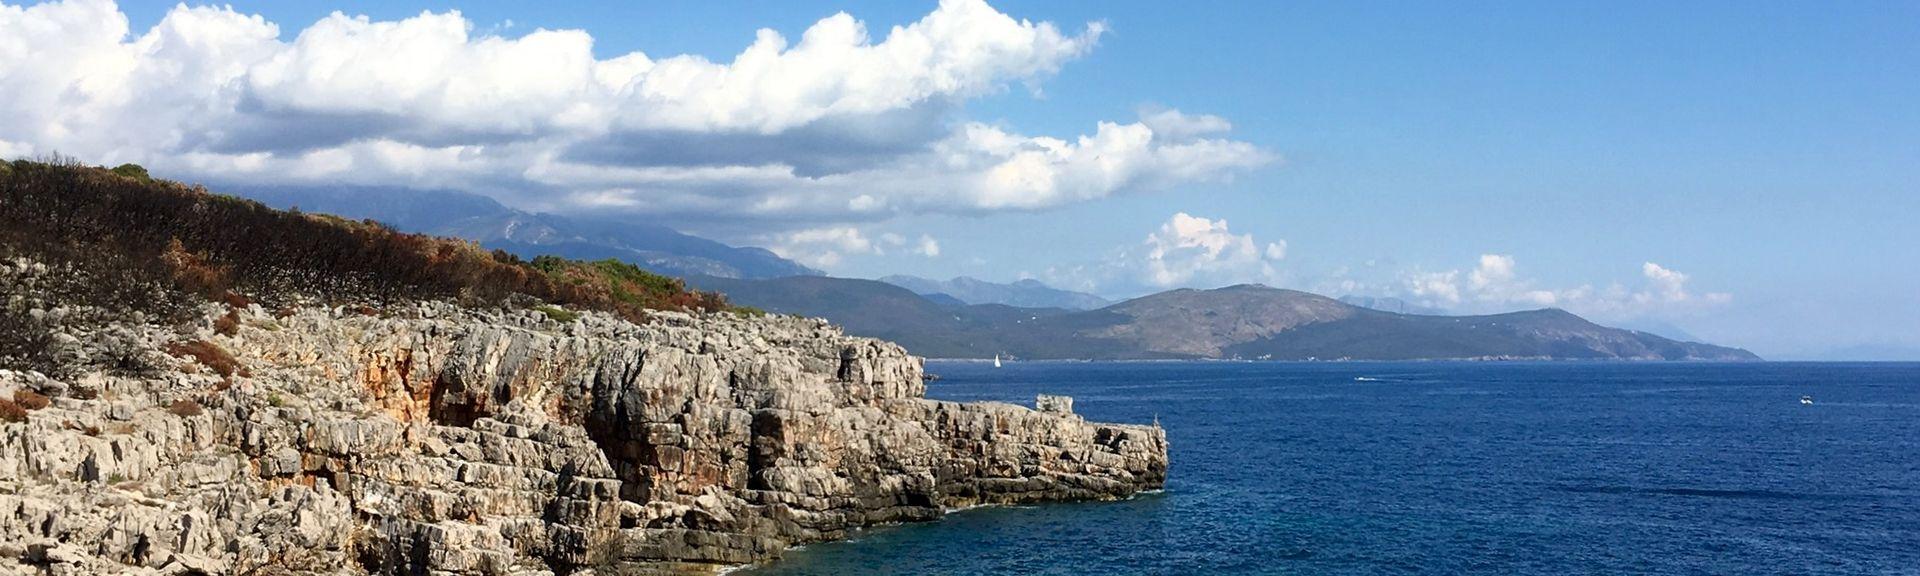 Igalo, Montenegro